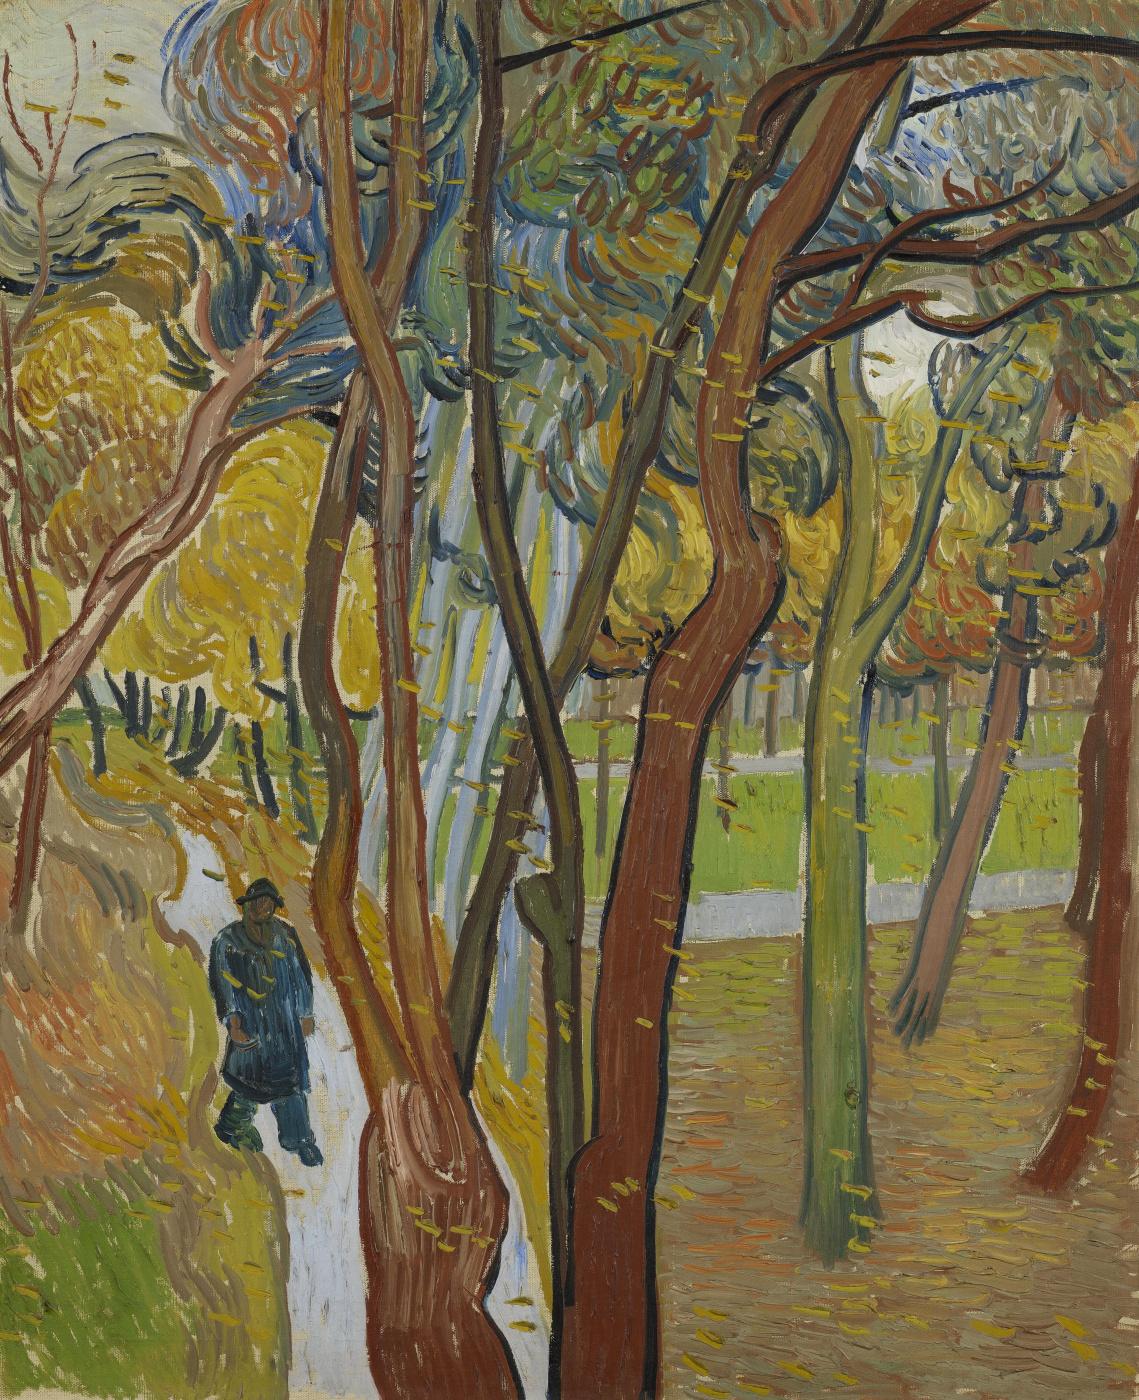 Vincent van Gogh. The leaf fall. Park hospital St. Paul's